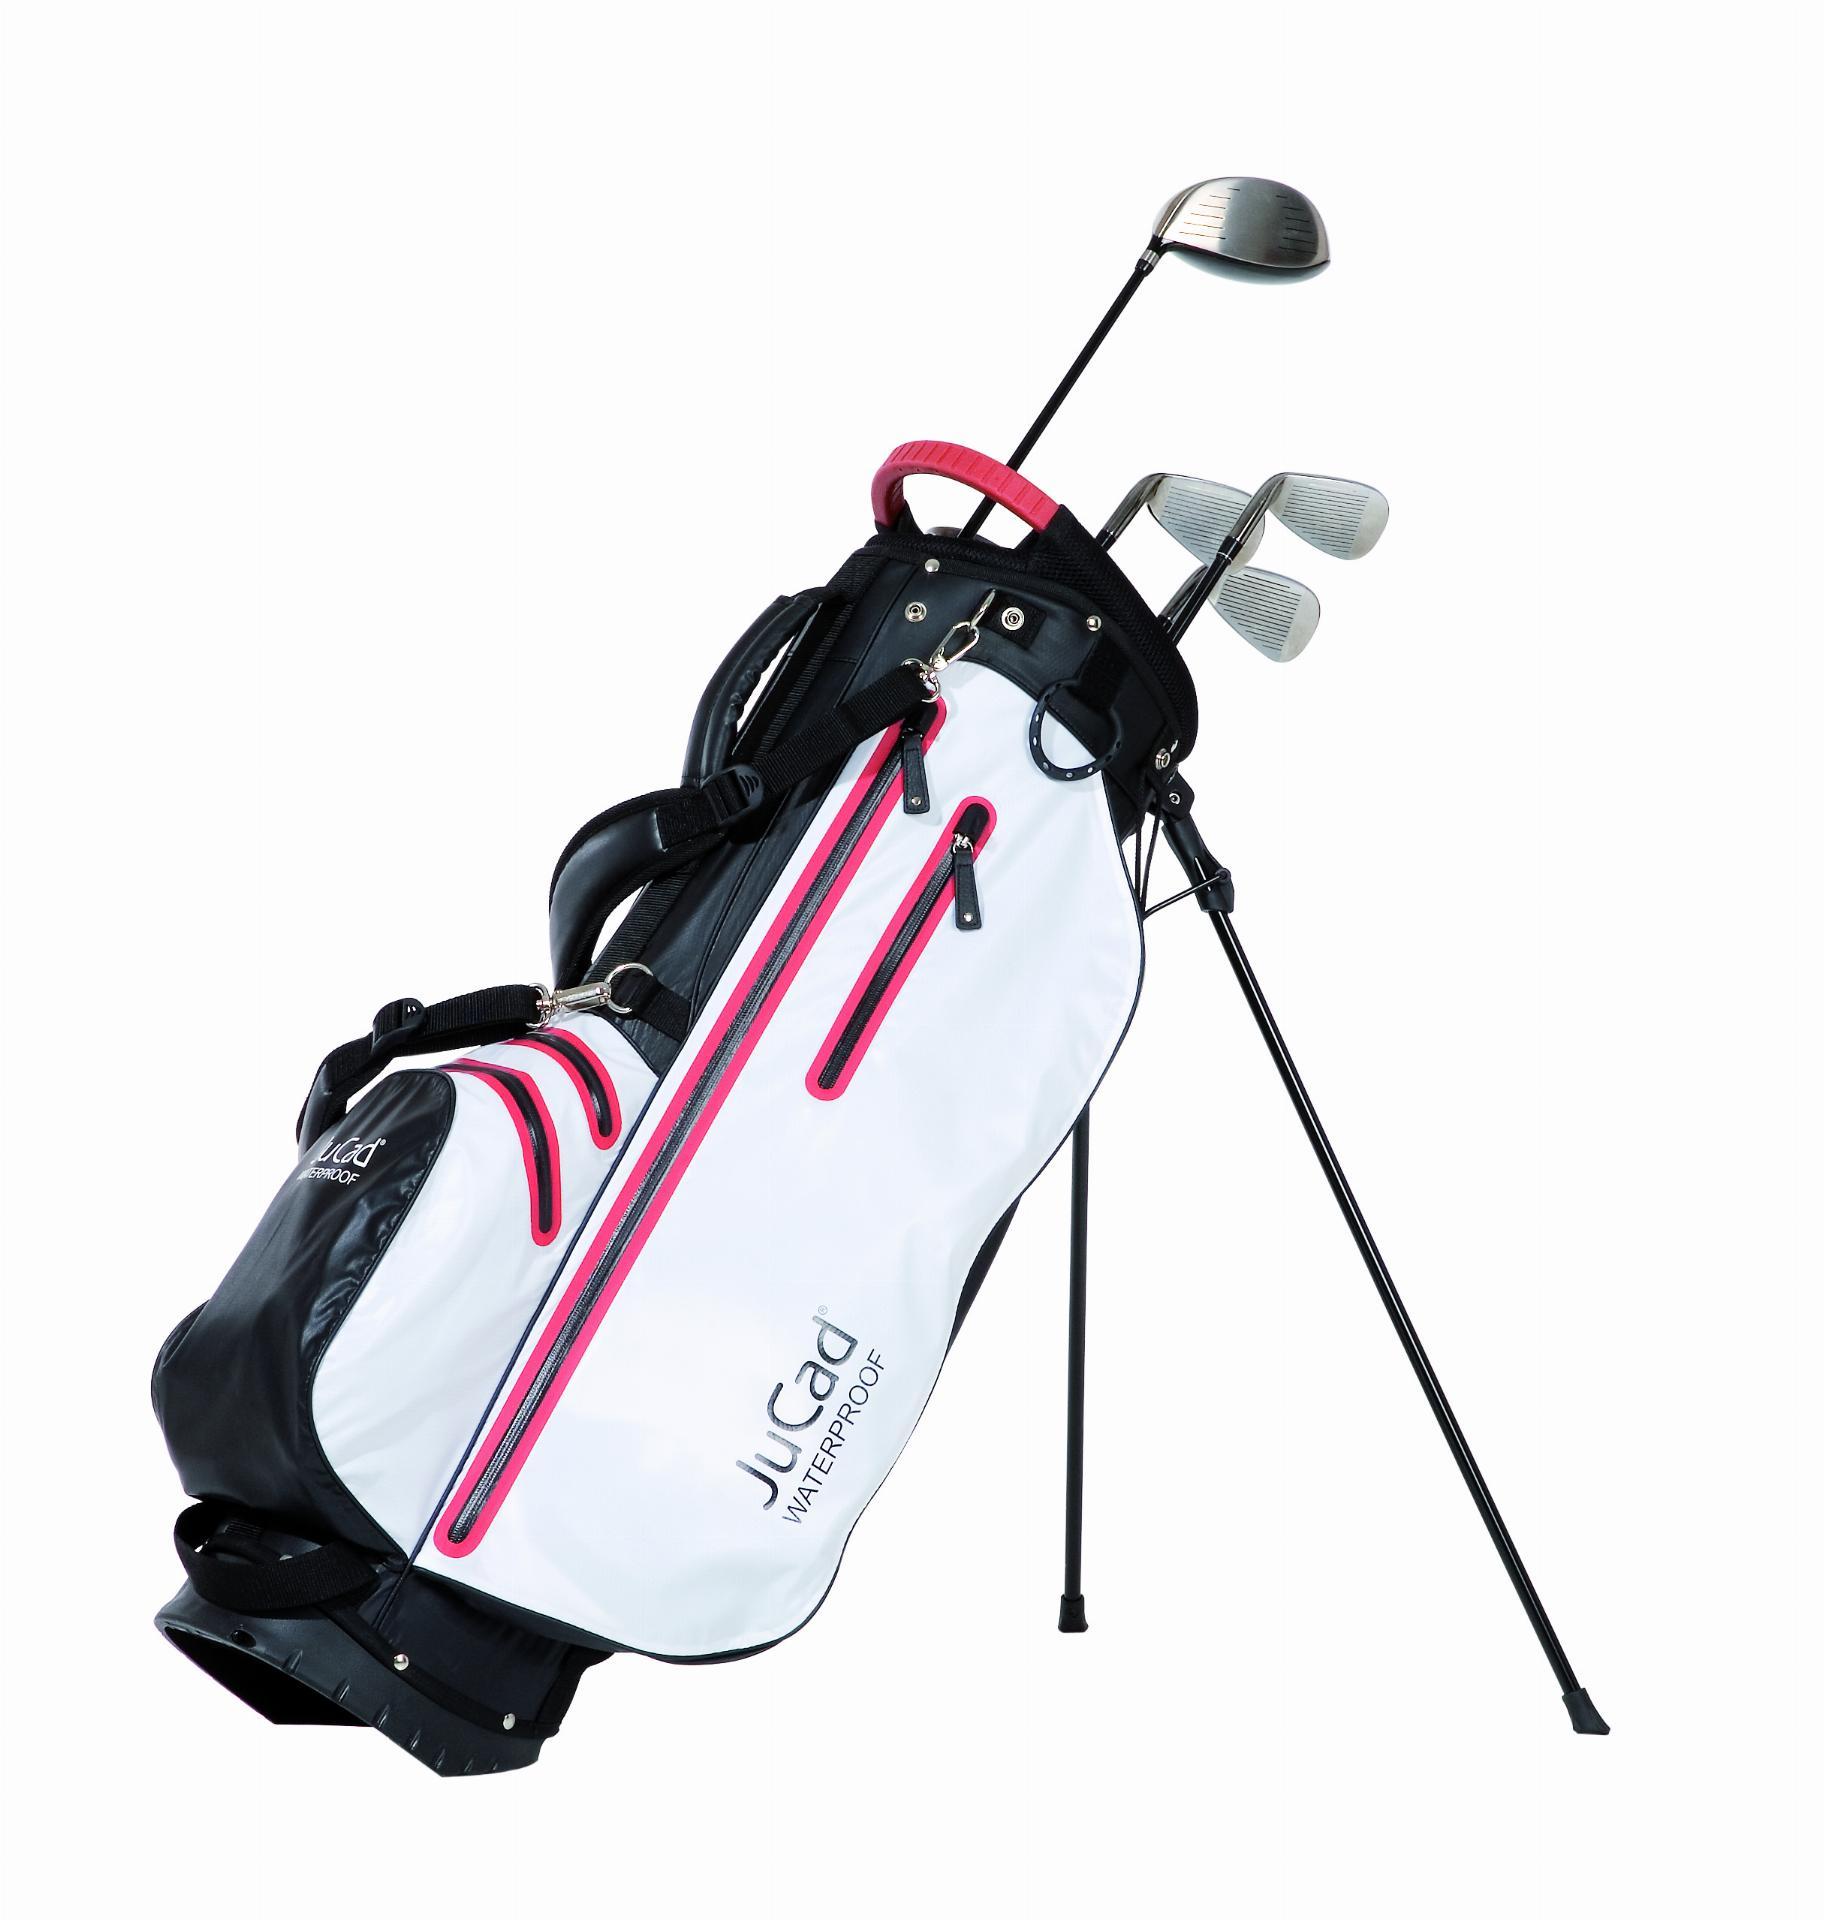 2 in 1 Waterproof Standbag, schwarz-weiß/rot